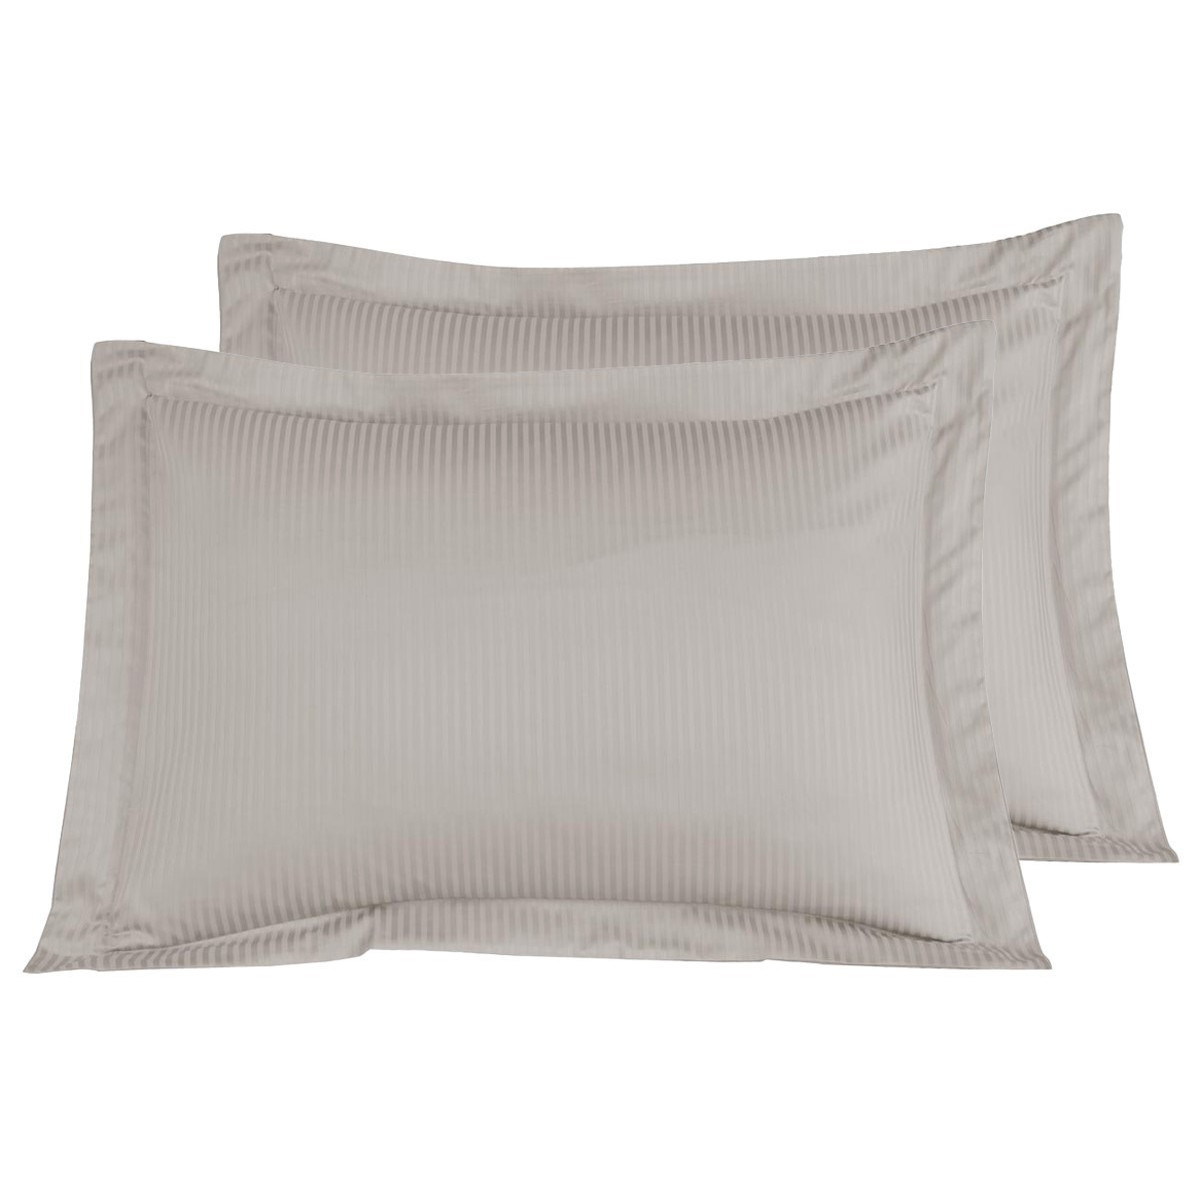 2 taies d'oreiller rayées satin coton Taupe 50x70 cm